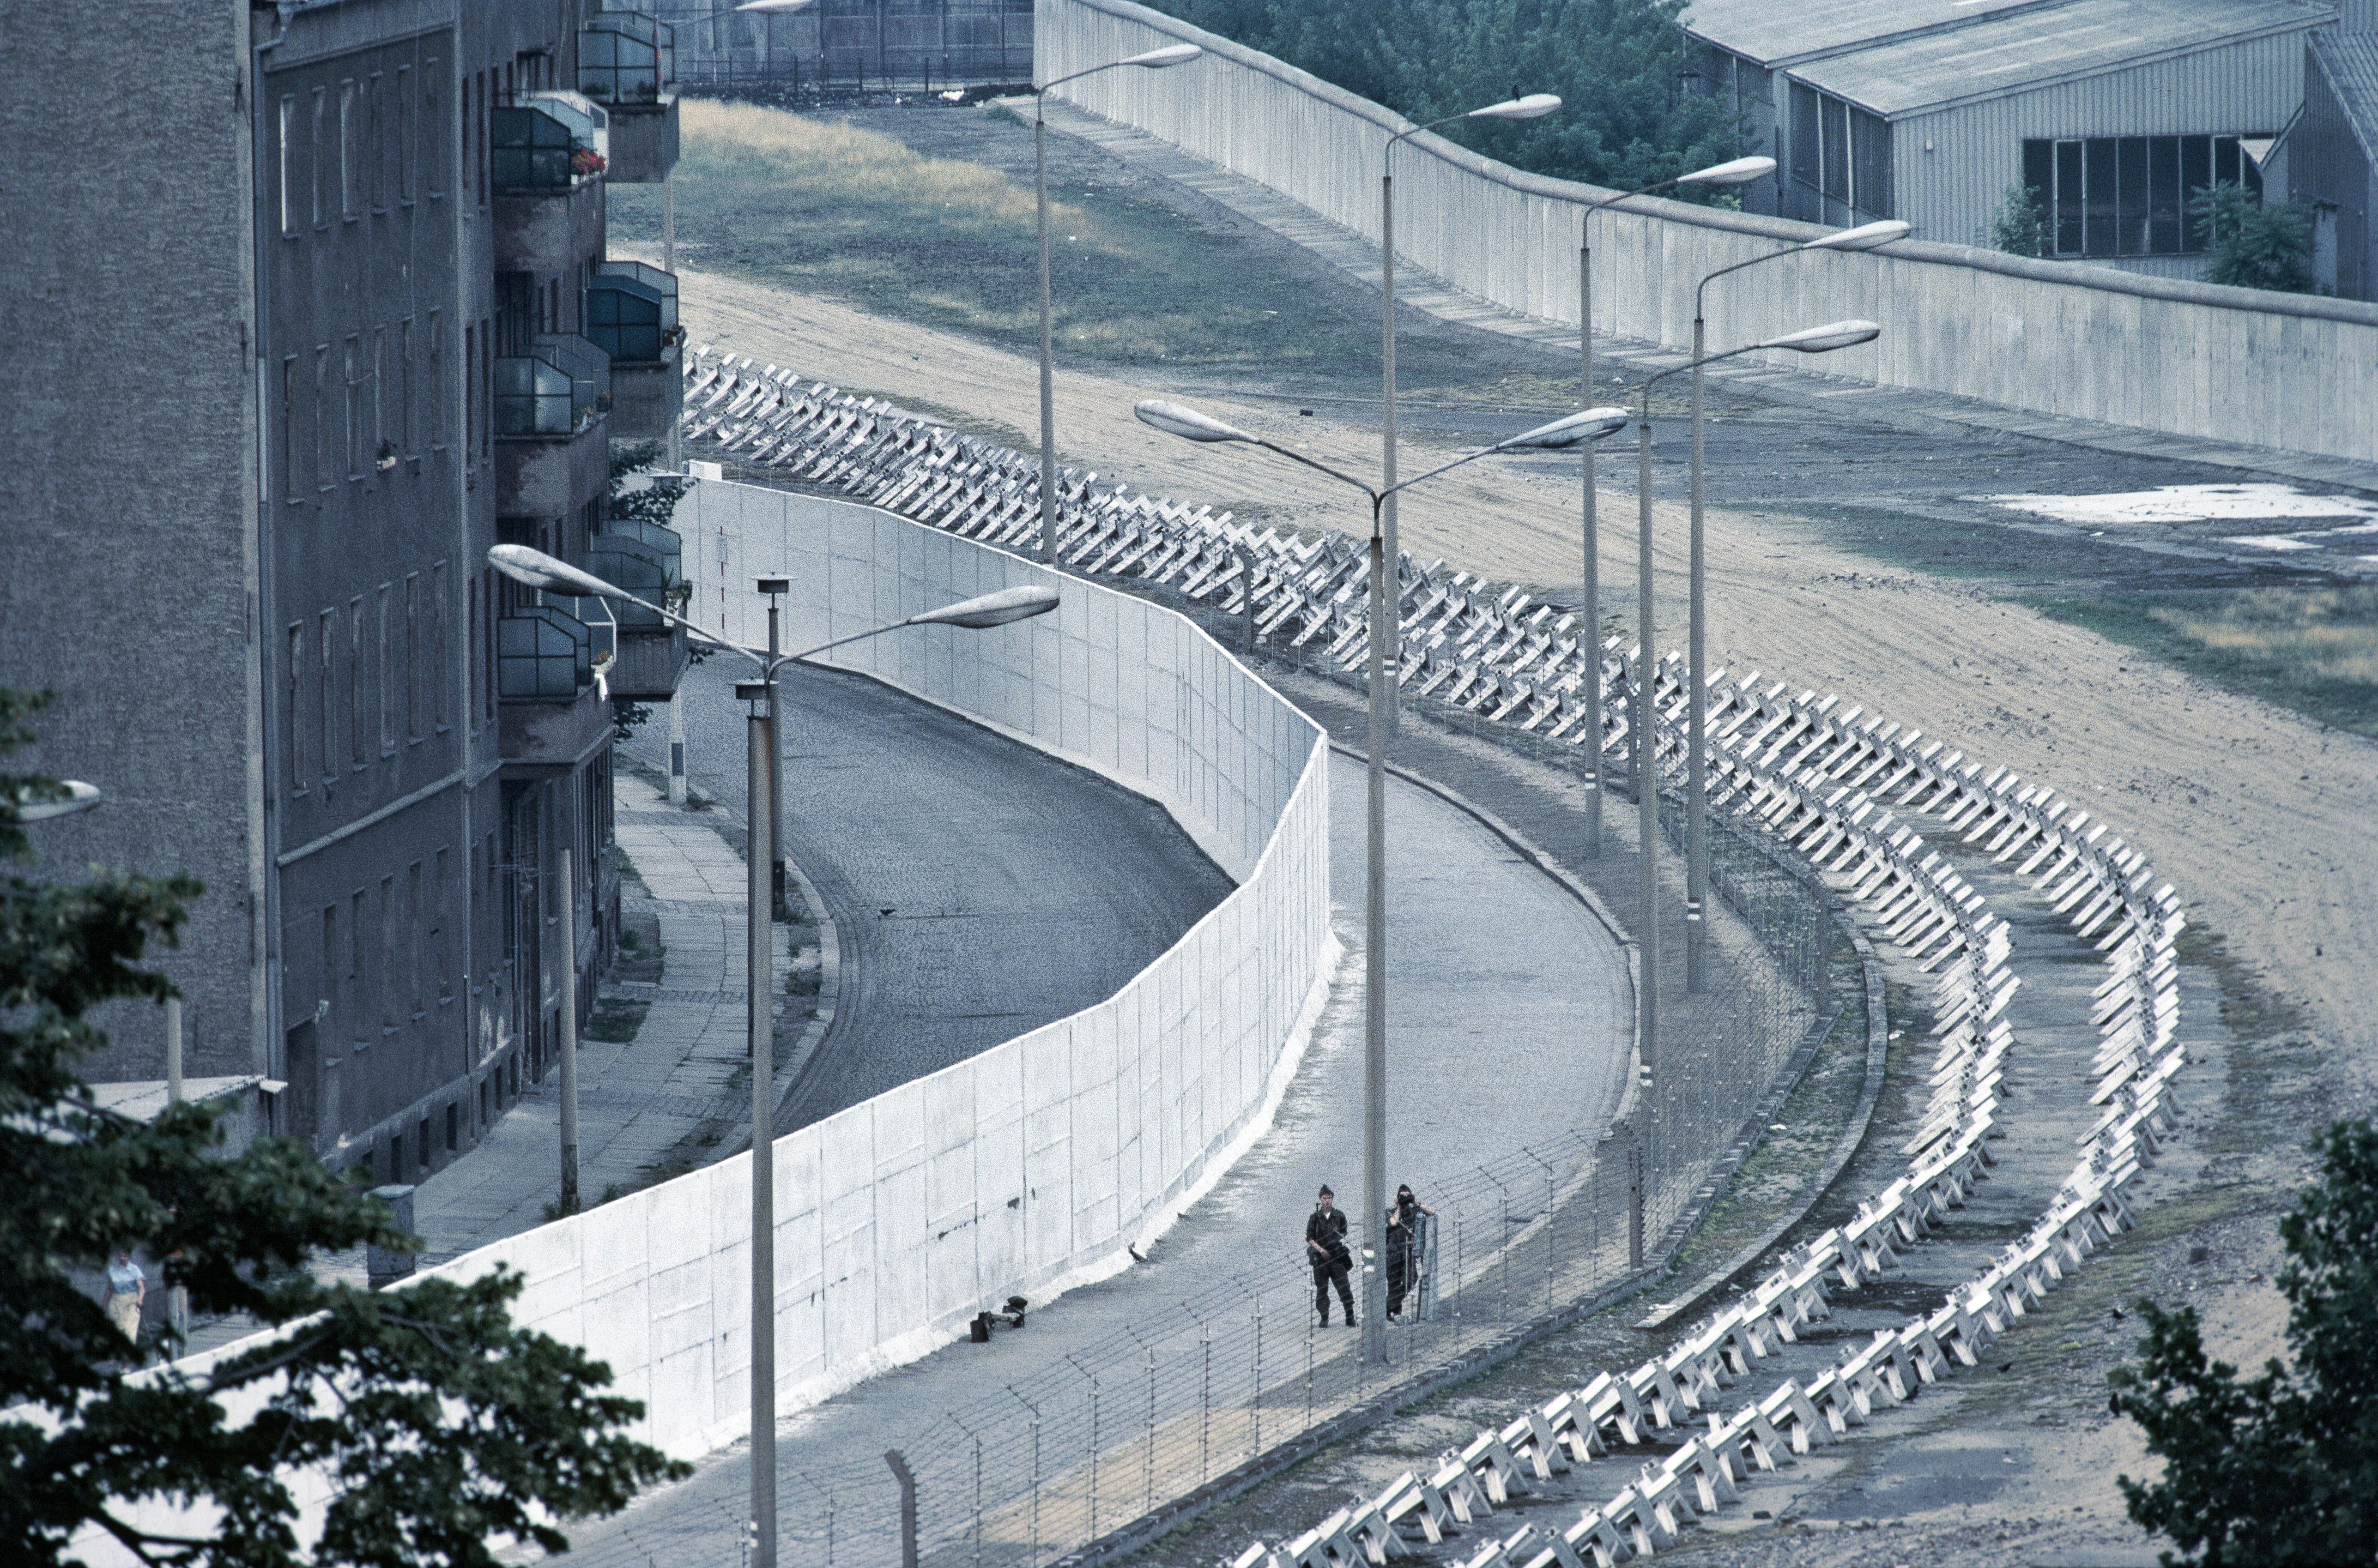 Soldiers patrolling the Berlin Wall Death Strip in 1981.